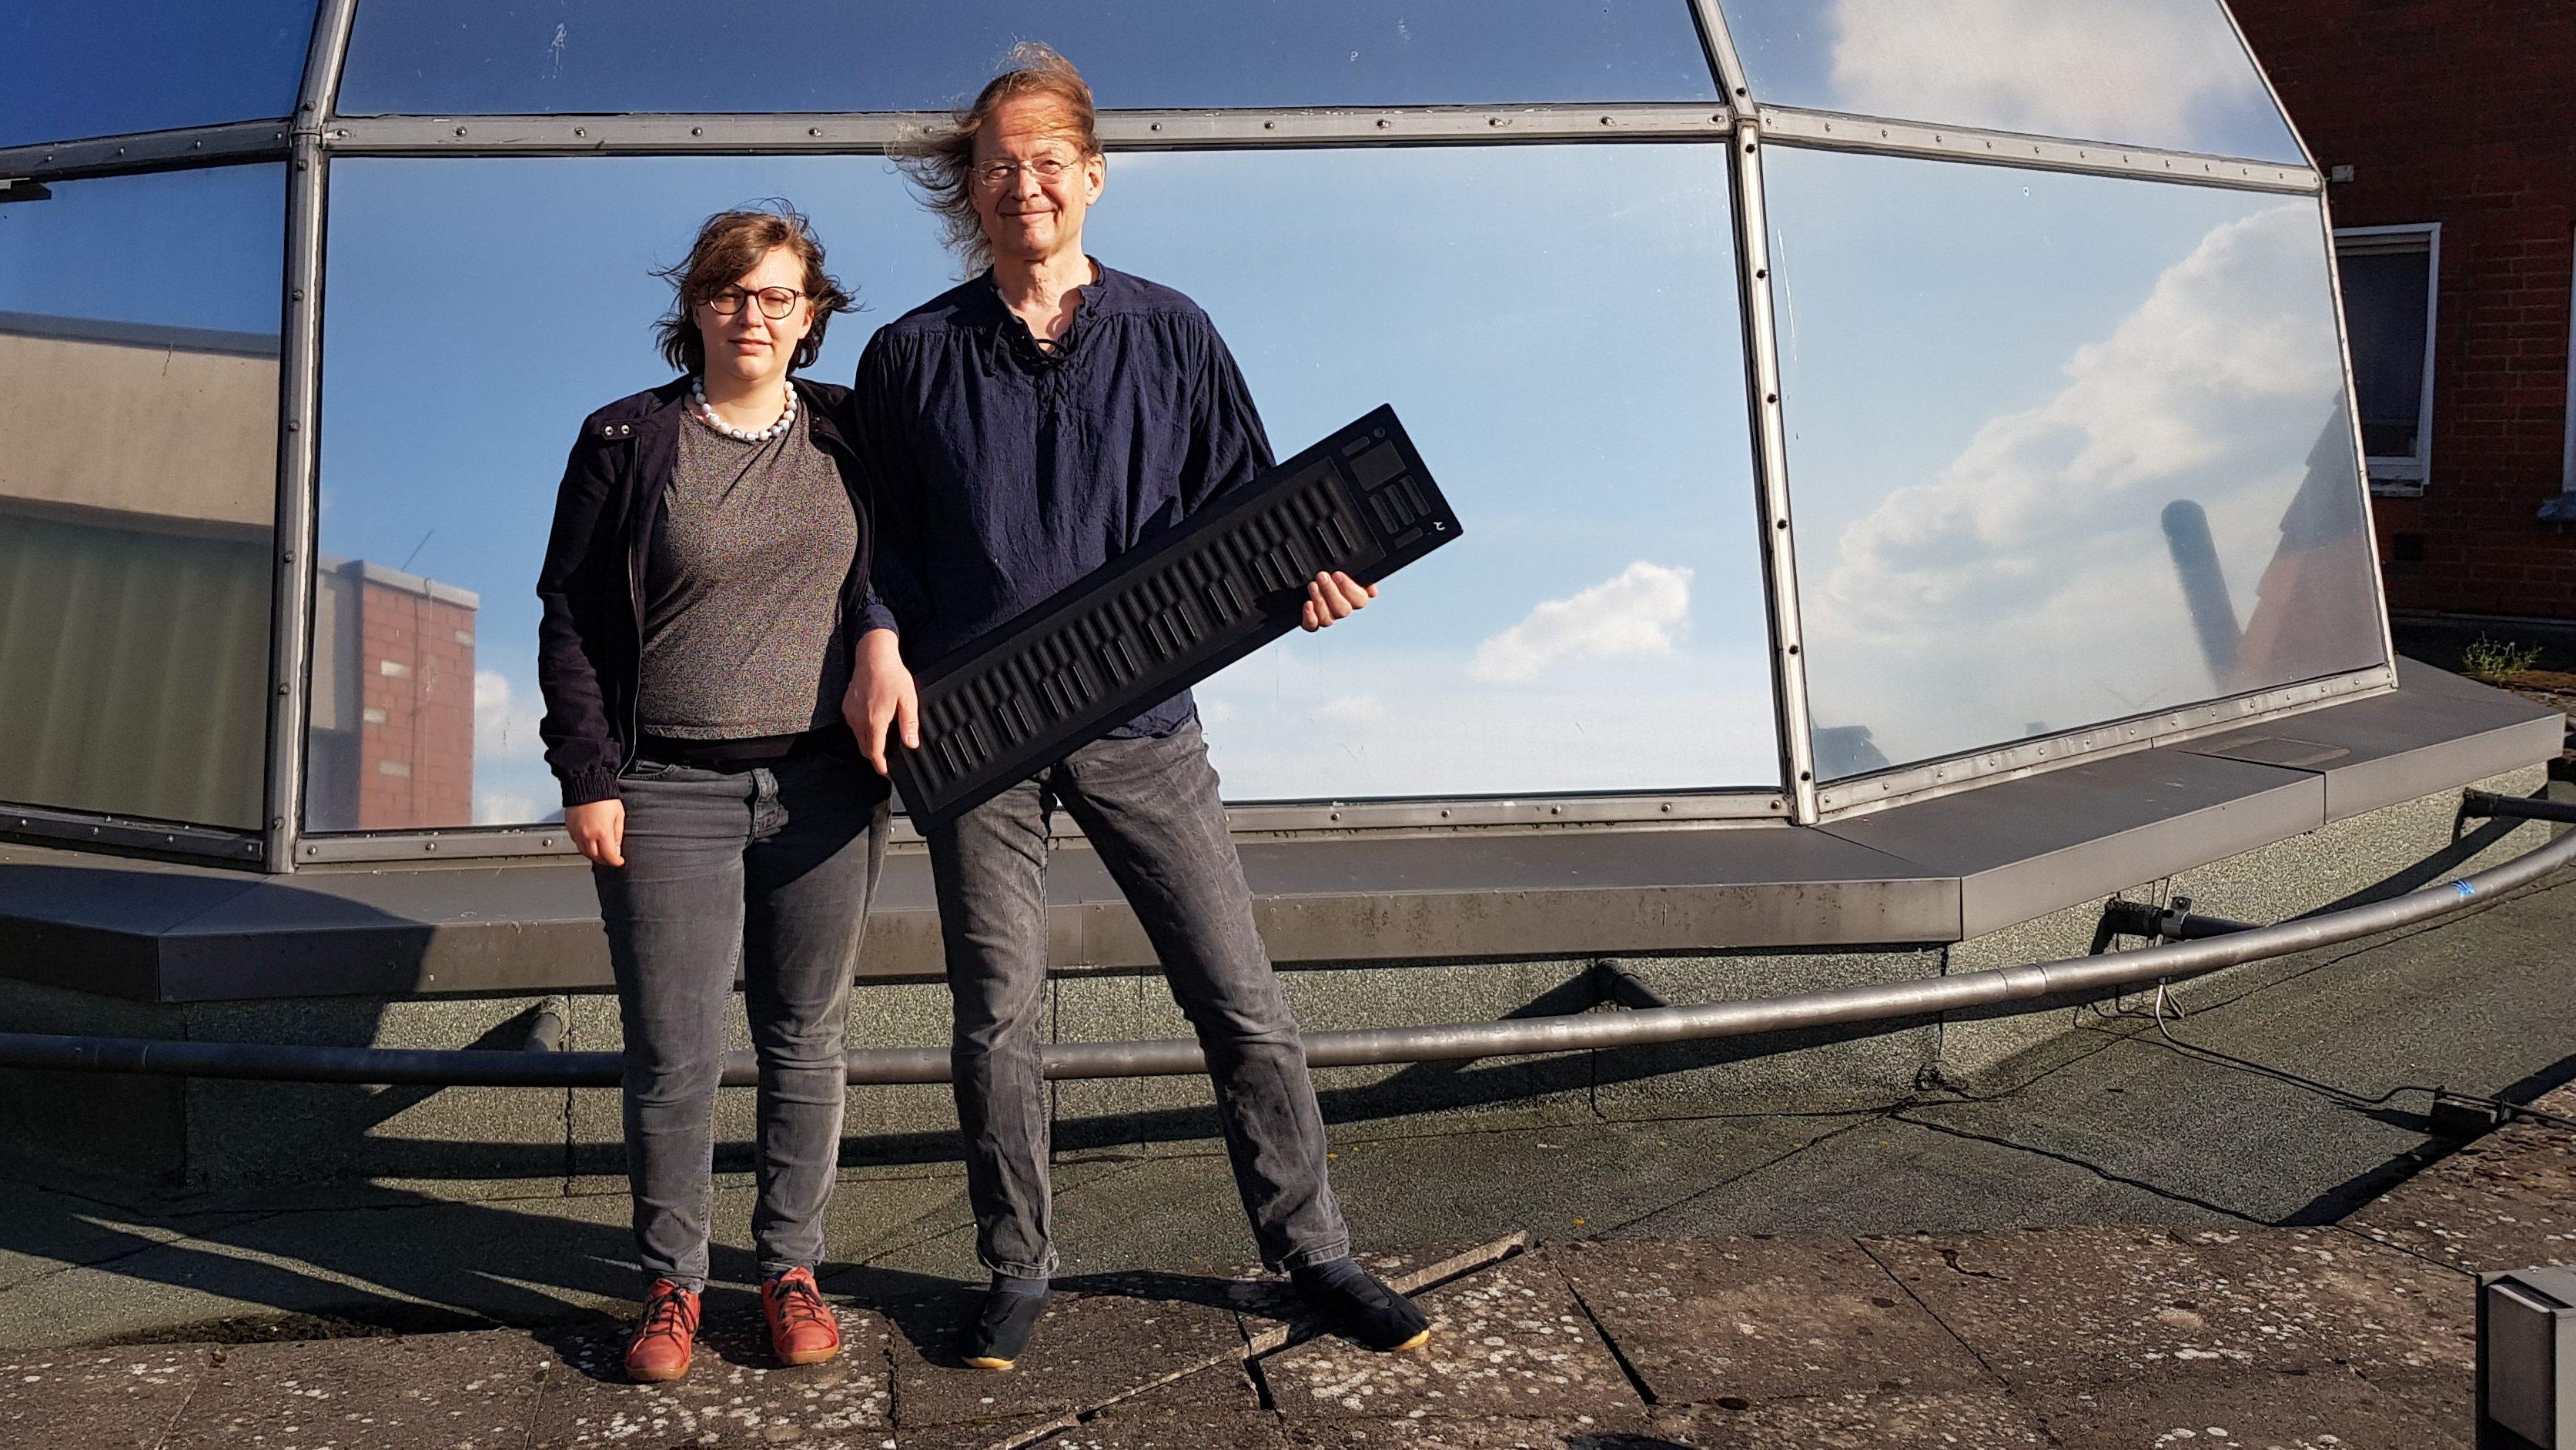 Funkhauskonzert Harald & AW